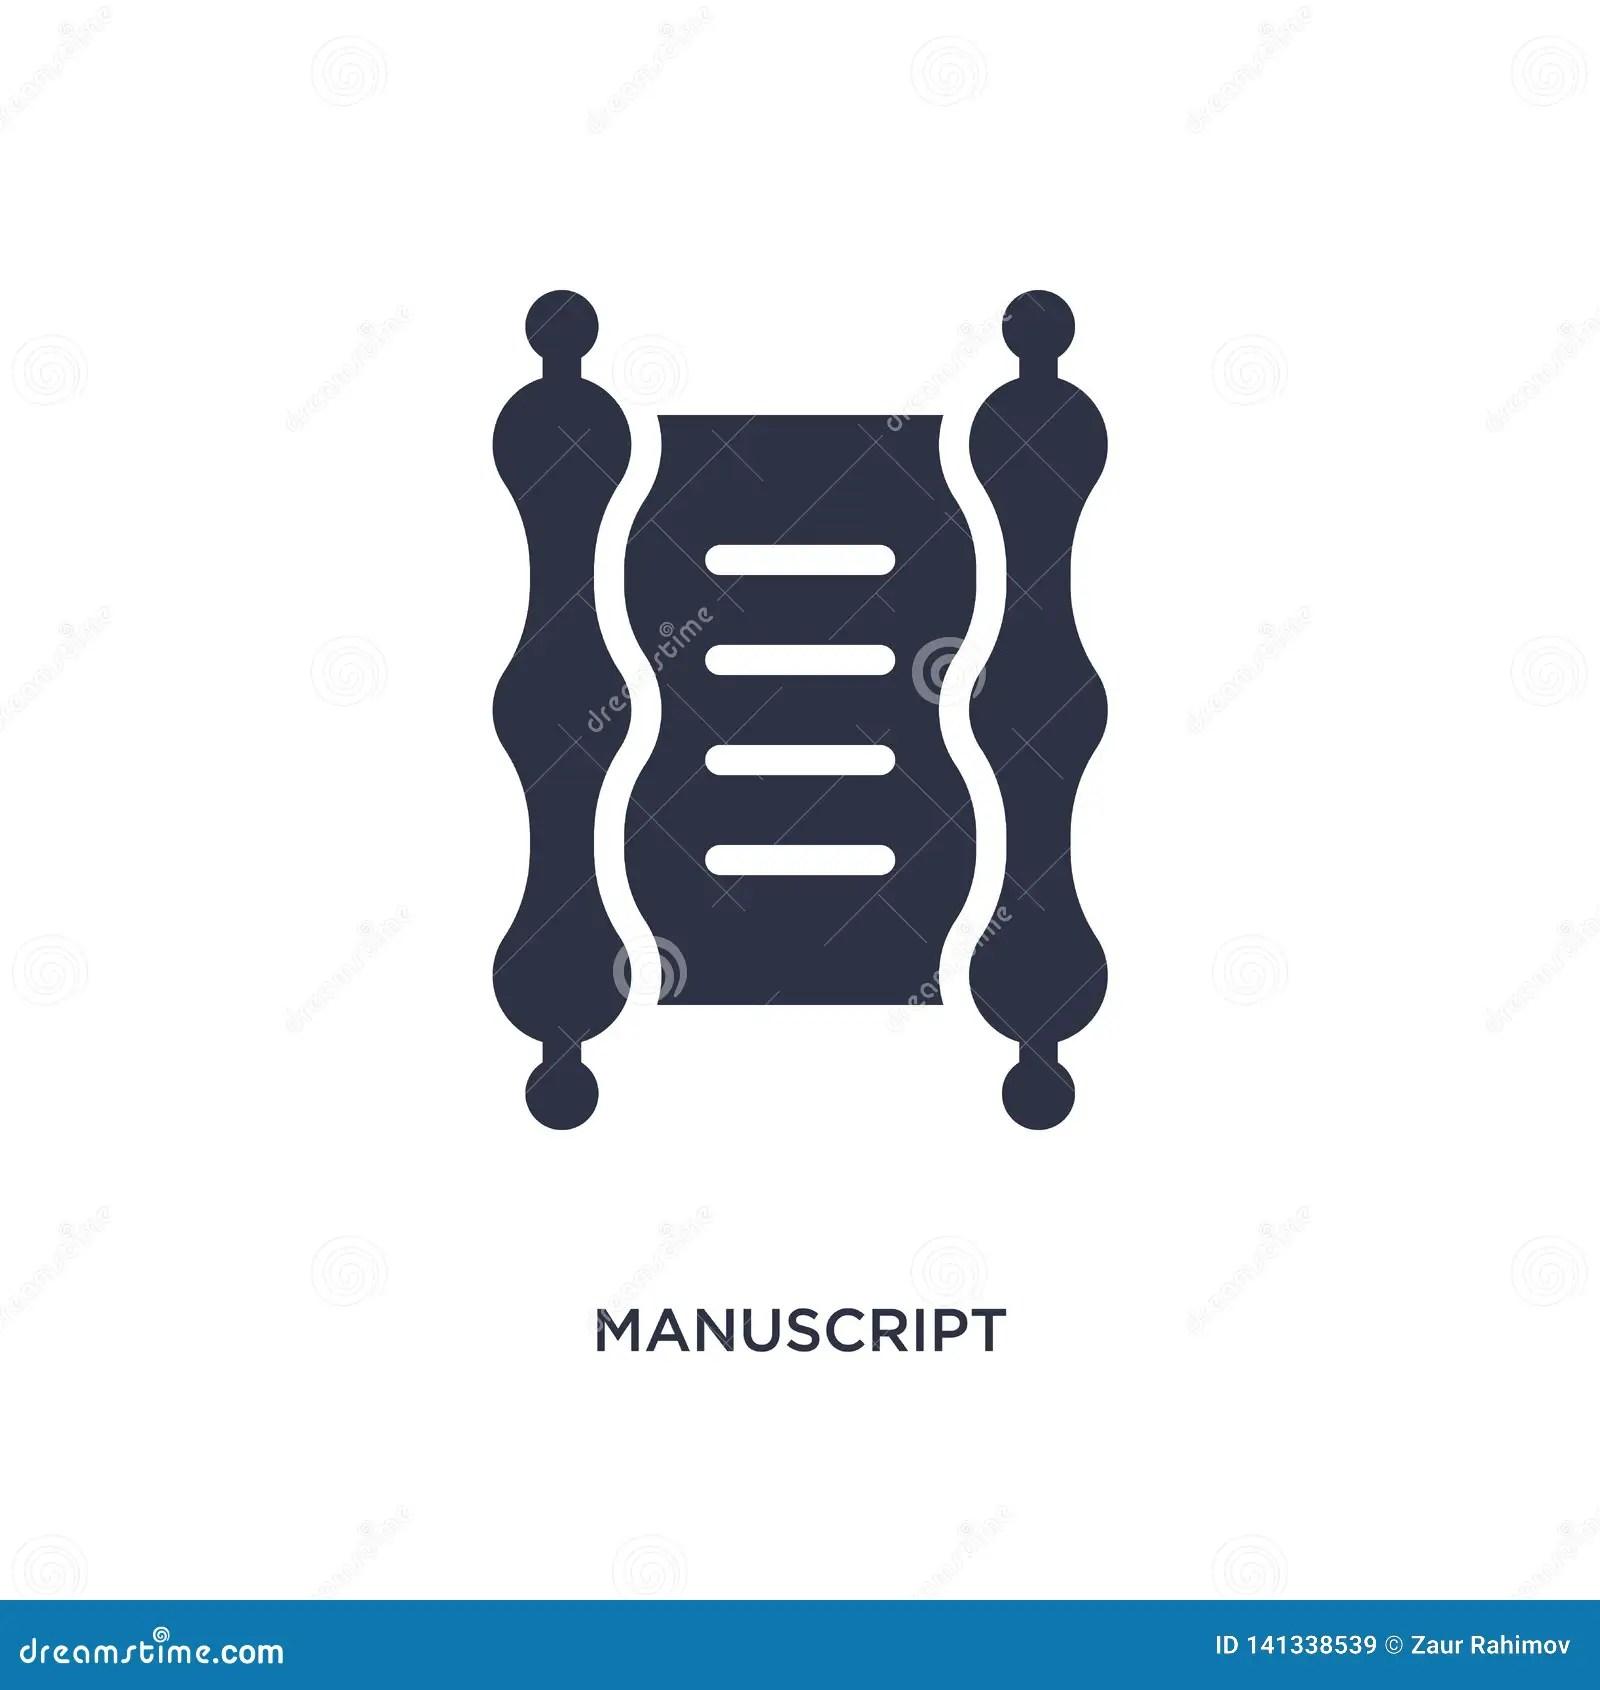 M Cript Icon On White Background Simple Element